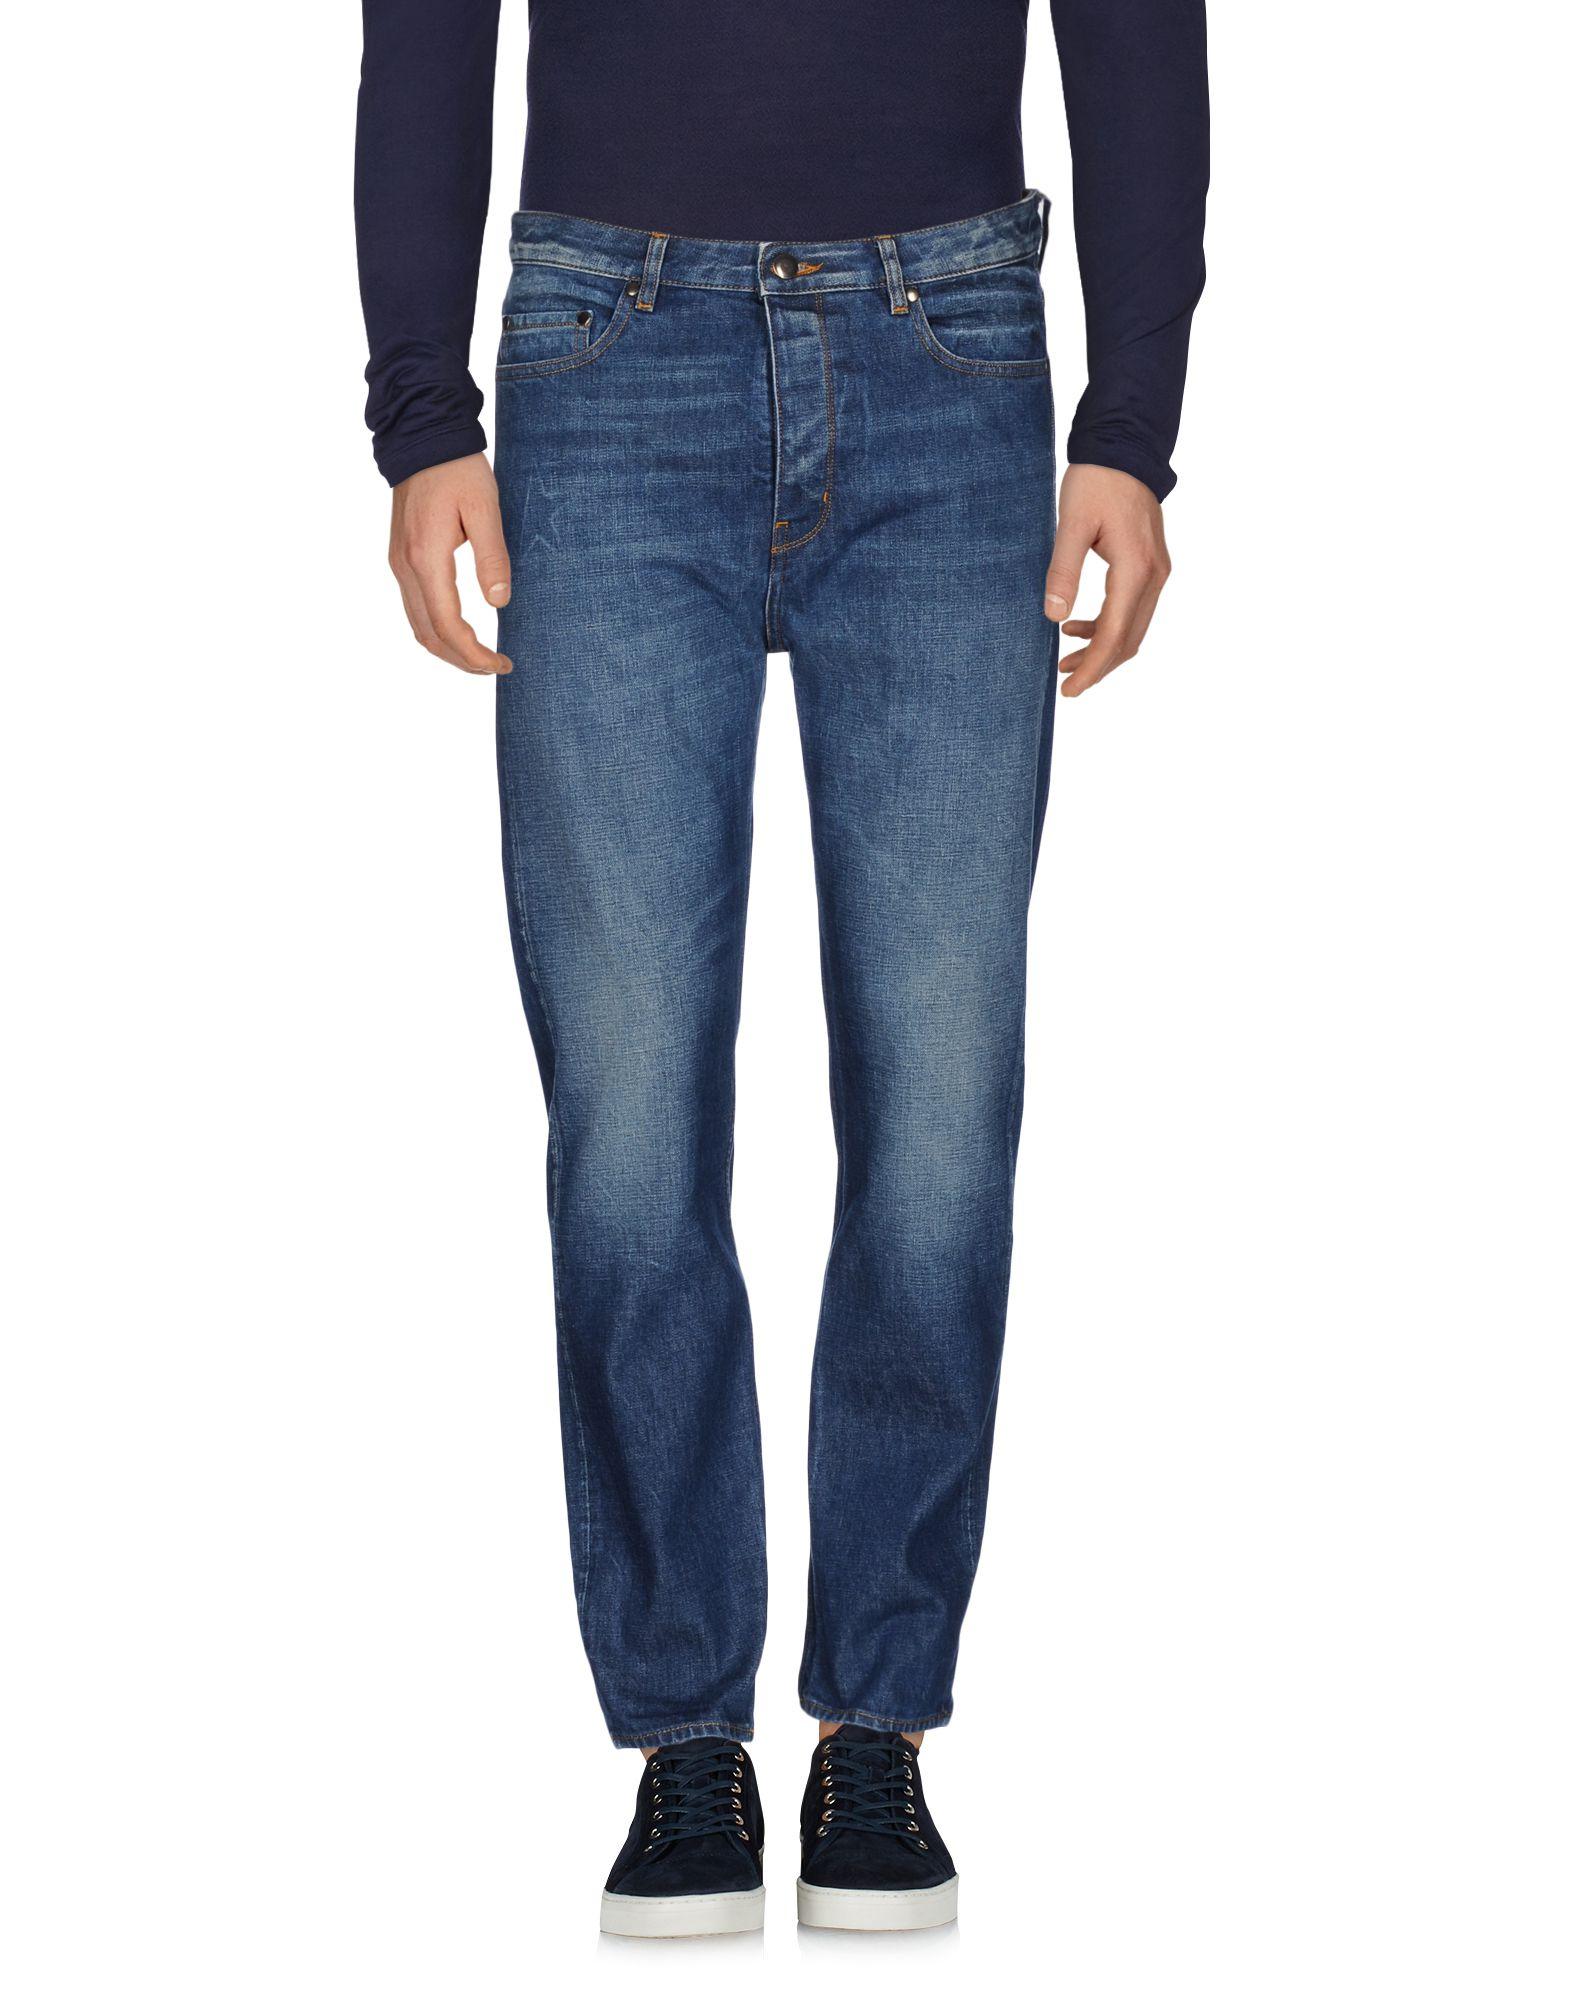 Pantaloni Jeans Golden Goose Deluxe Brand Uomo - Acquista online su